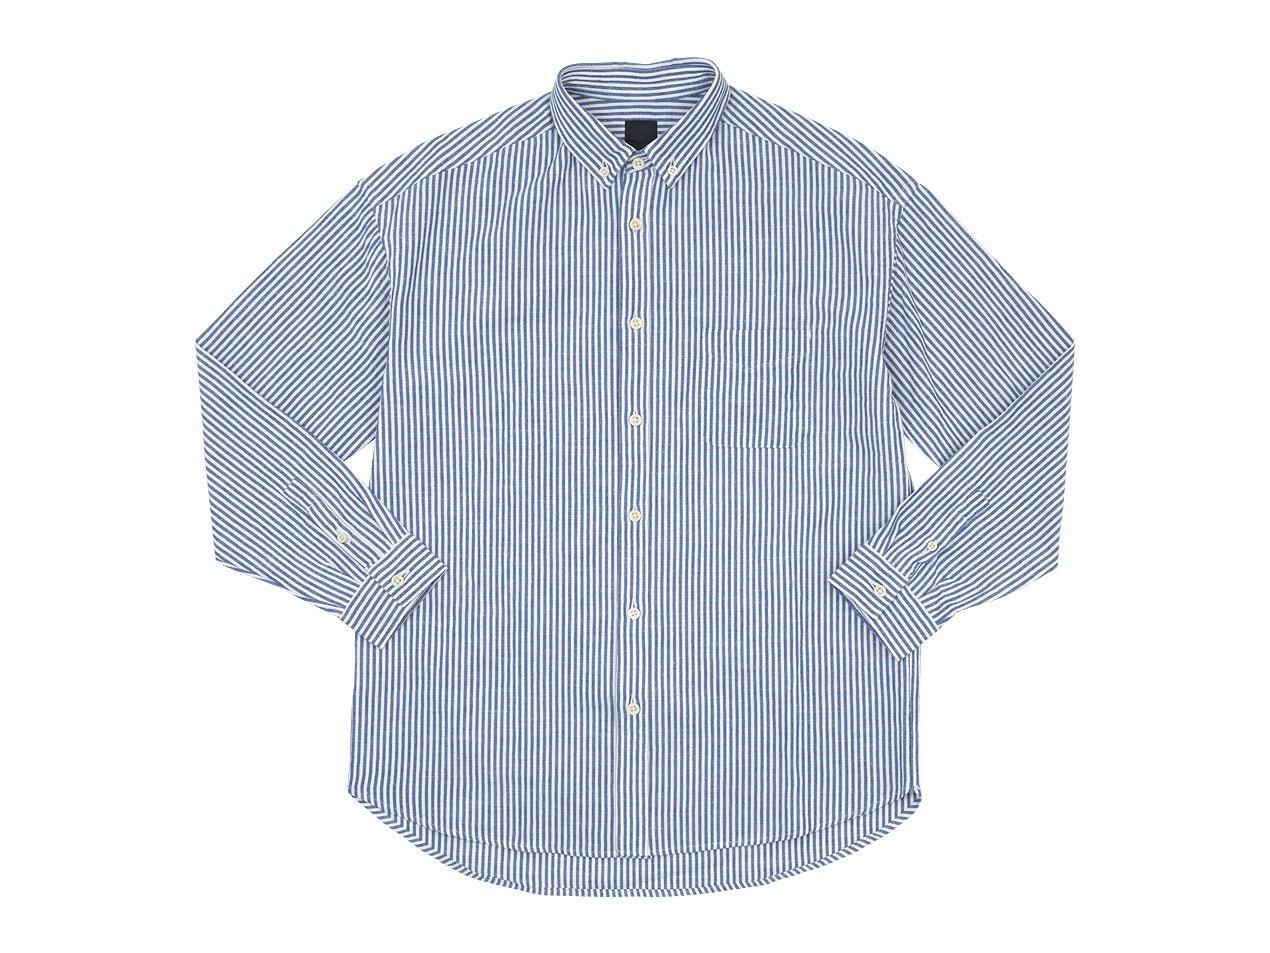 maillot sunset relax B.D. shirts BLUE STRIPE